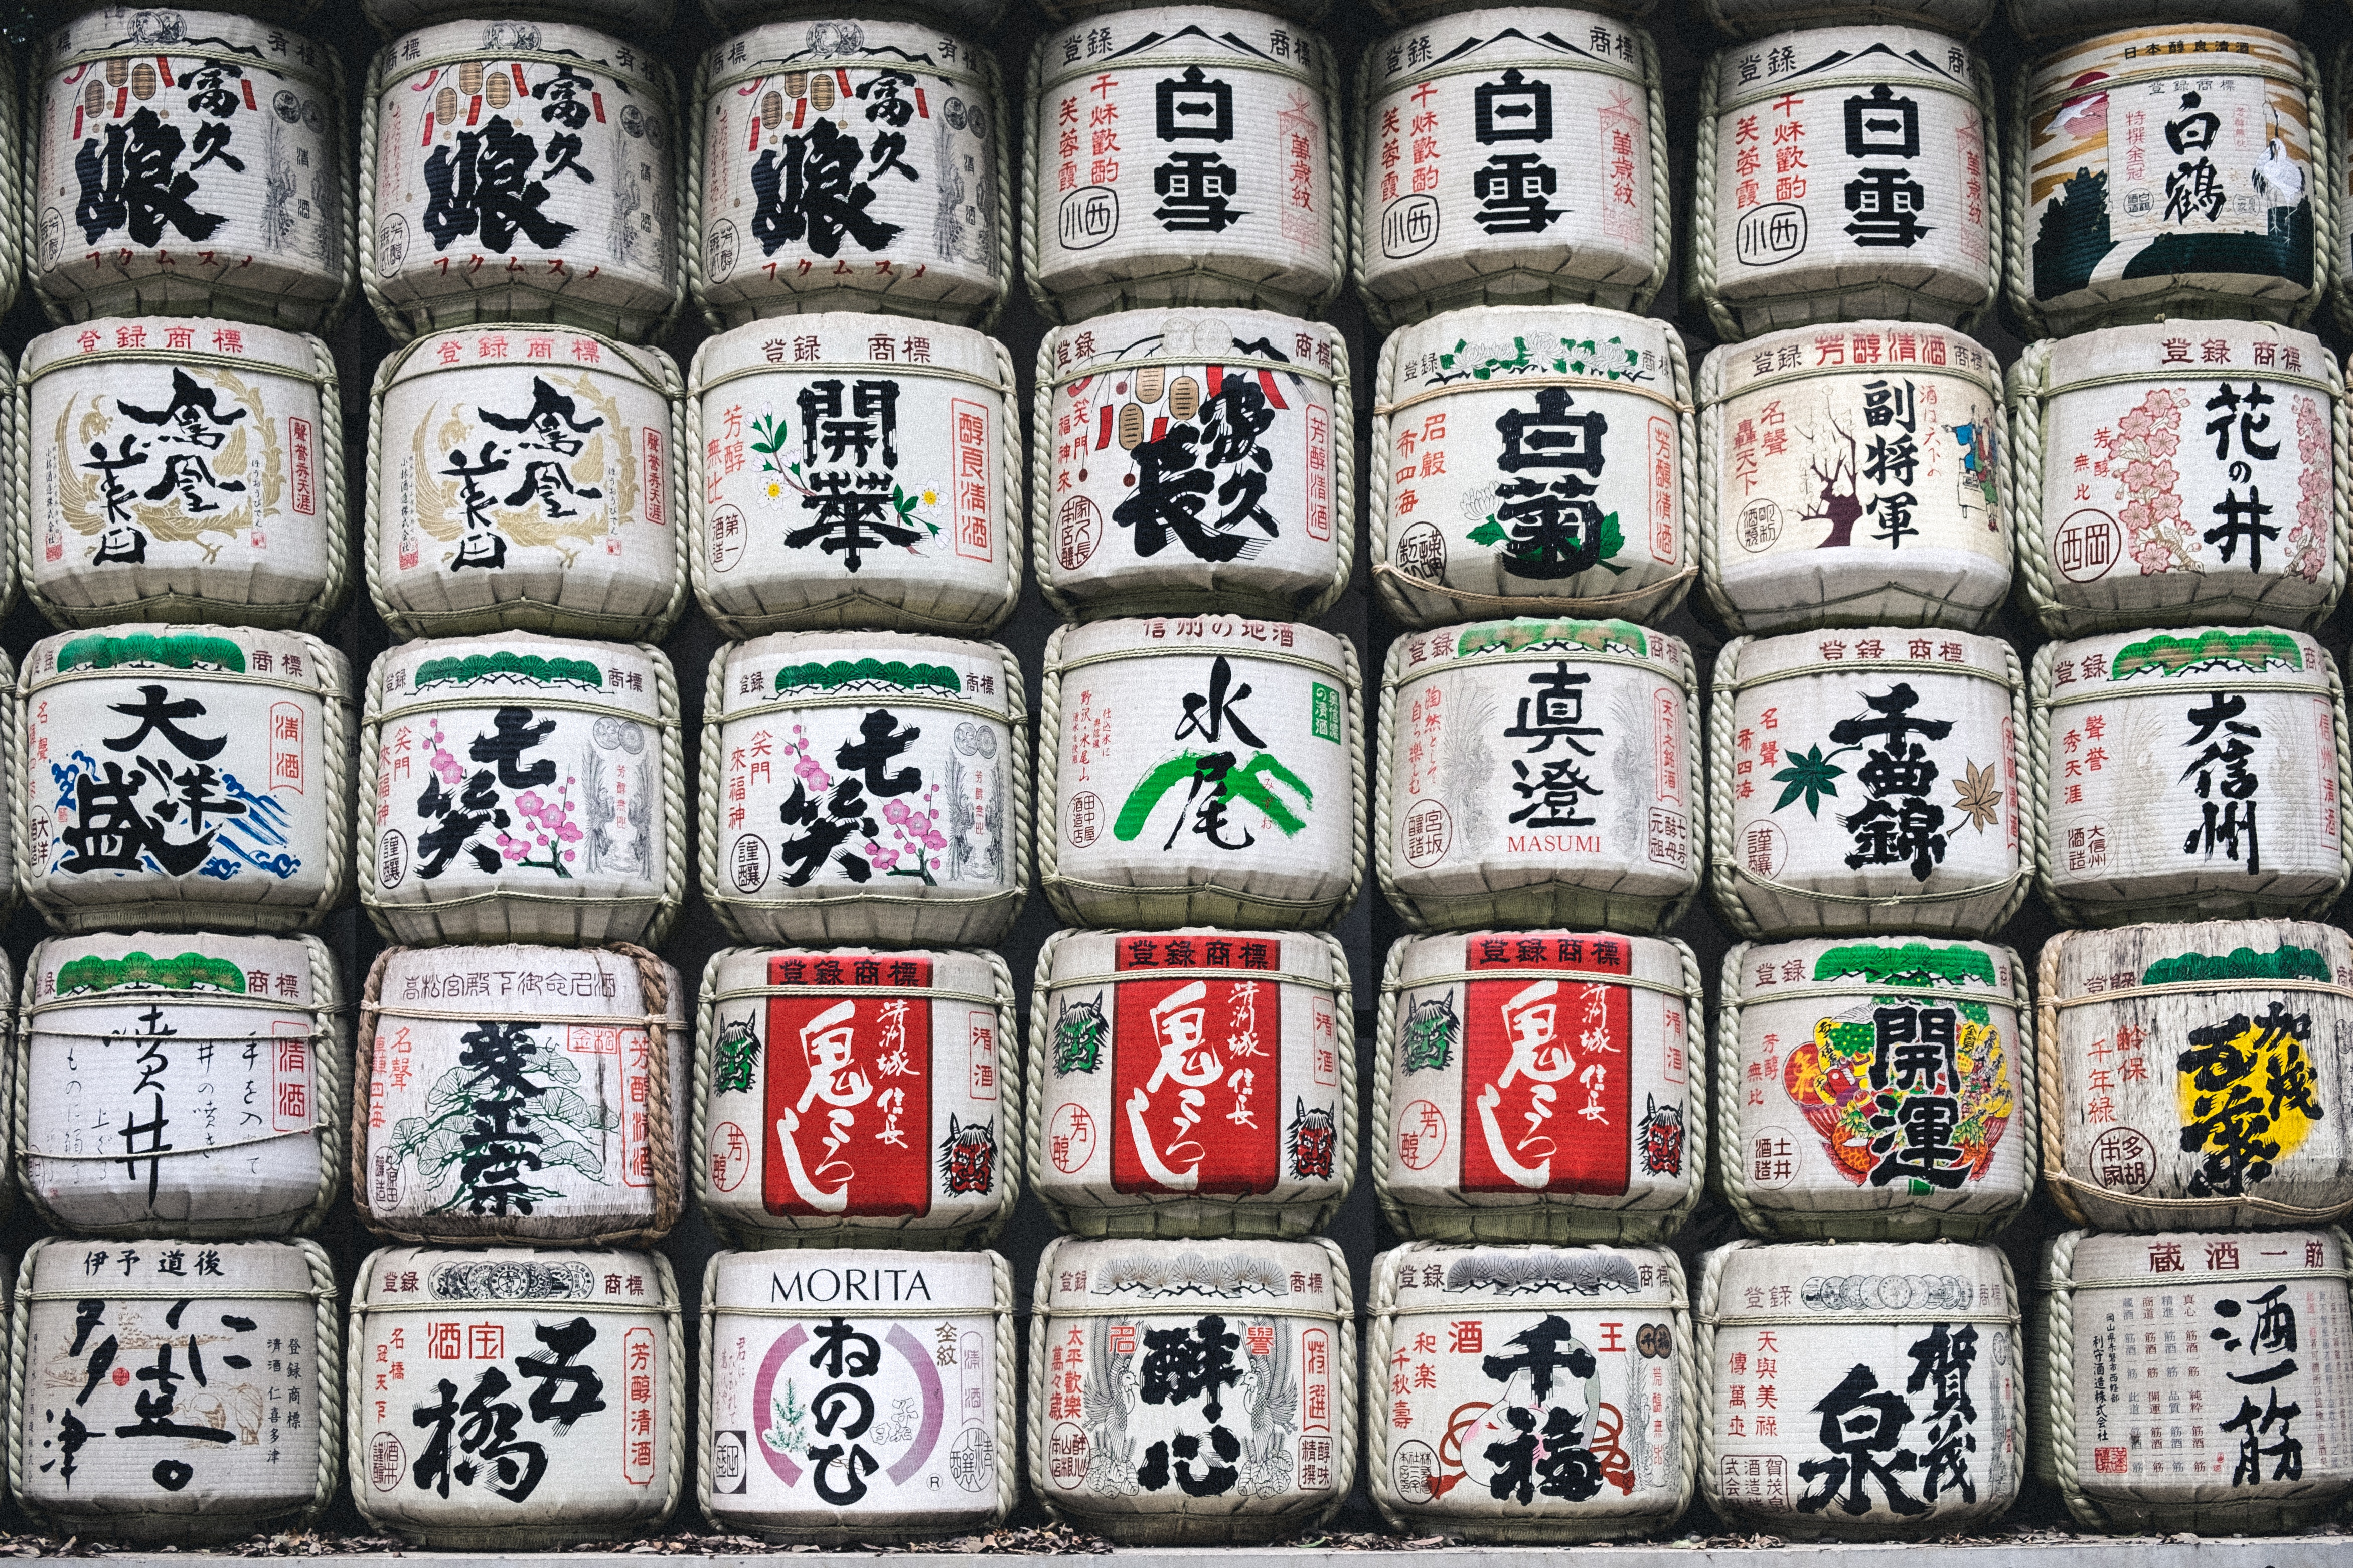 Take this free brewery tour to savor snow-preserved sake